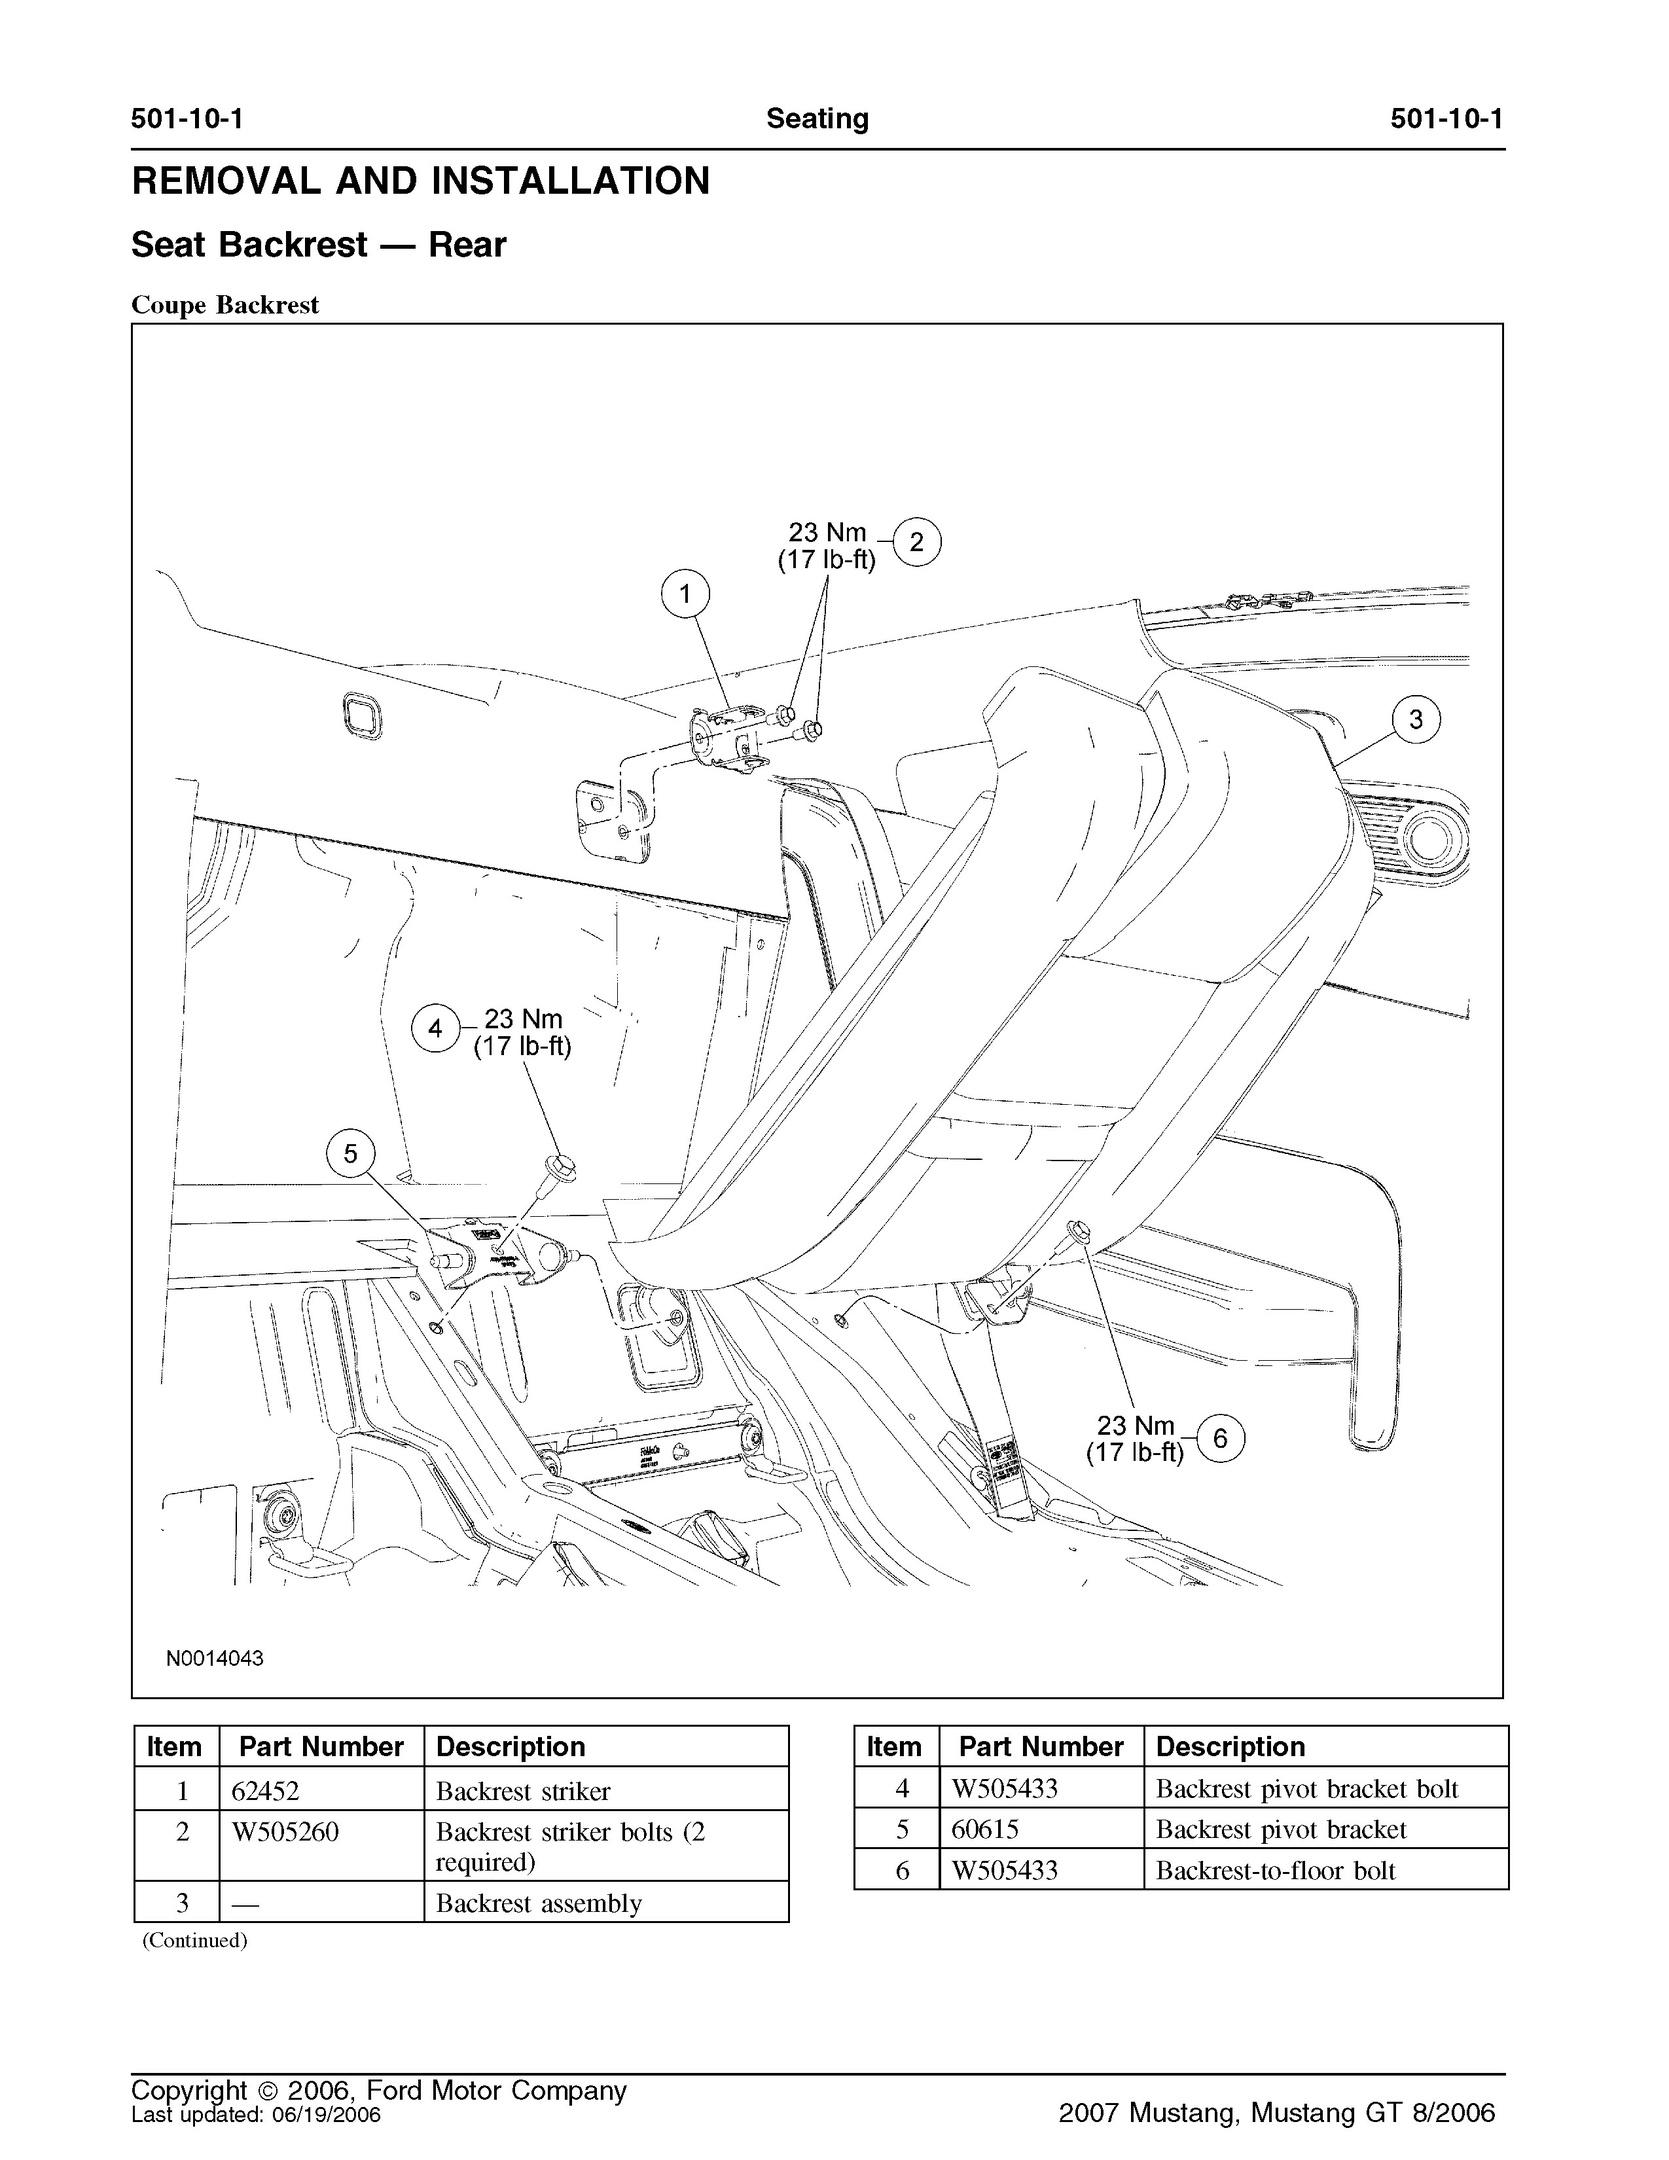 06 mustang wiring diagram 7f4bd1 2006 ford mustang manuals pdf wiring library  7f4bd1 2006 ford mustang manuals pdf